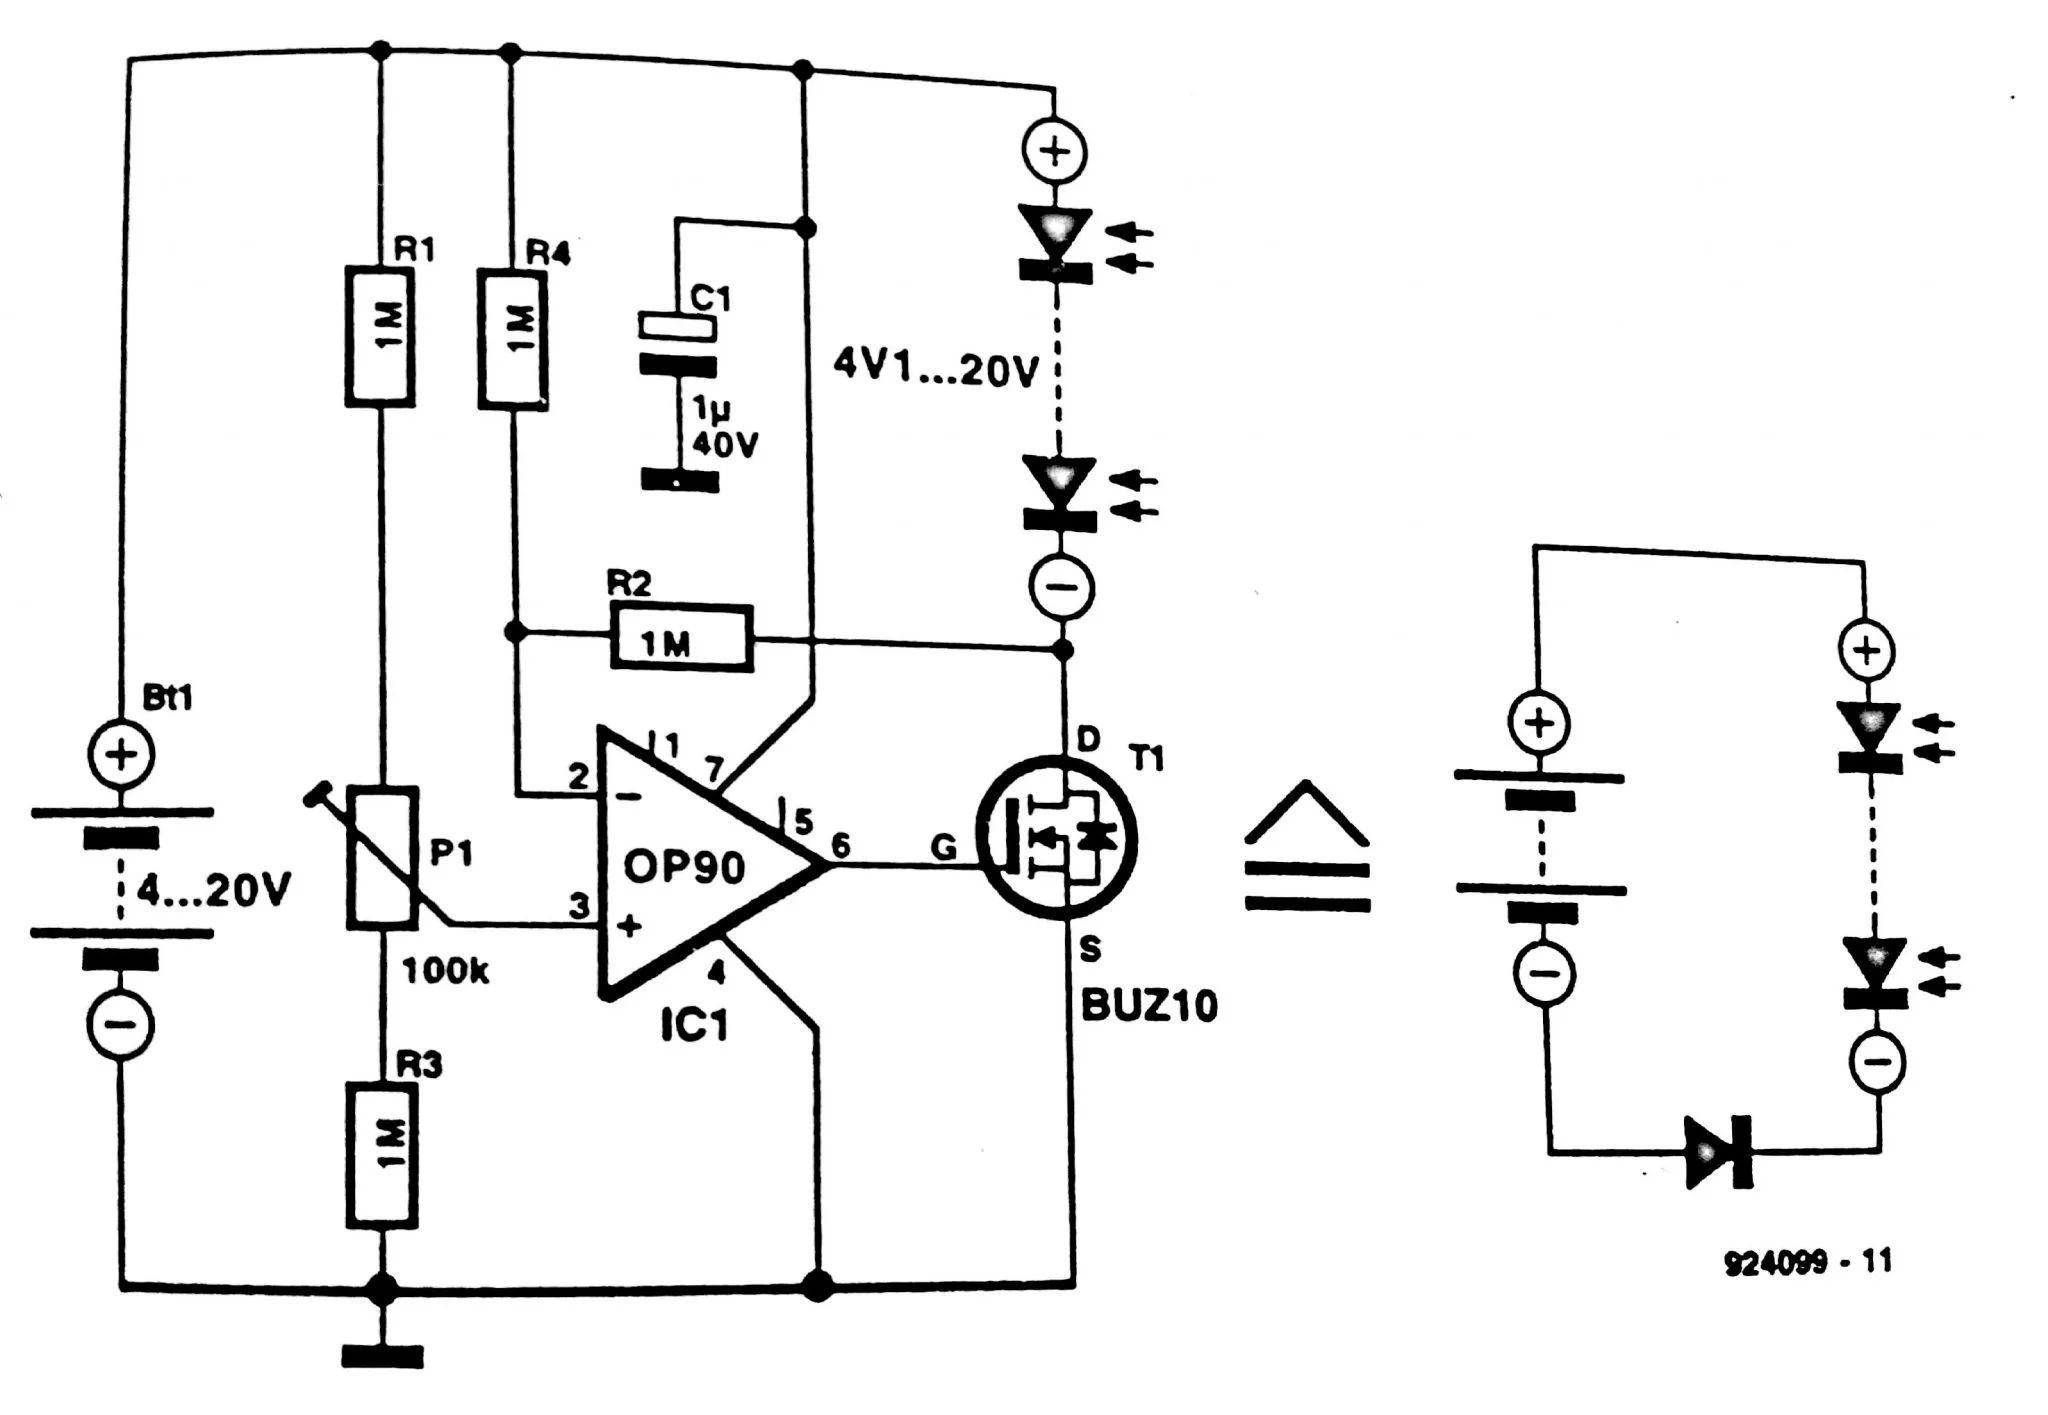 circuitdiagramofpowersupply